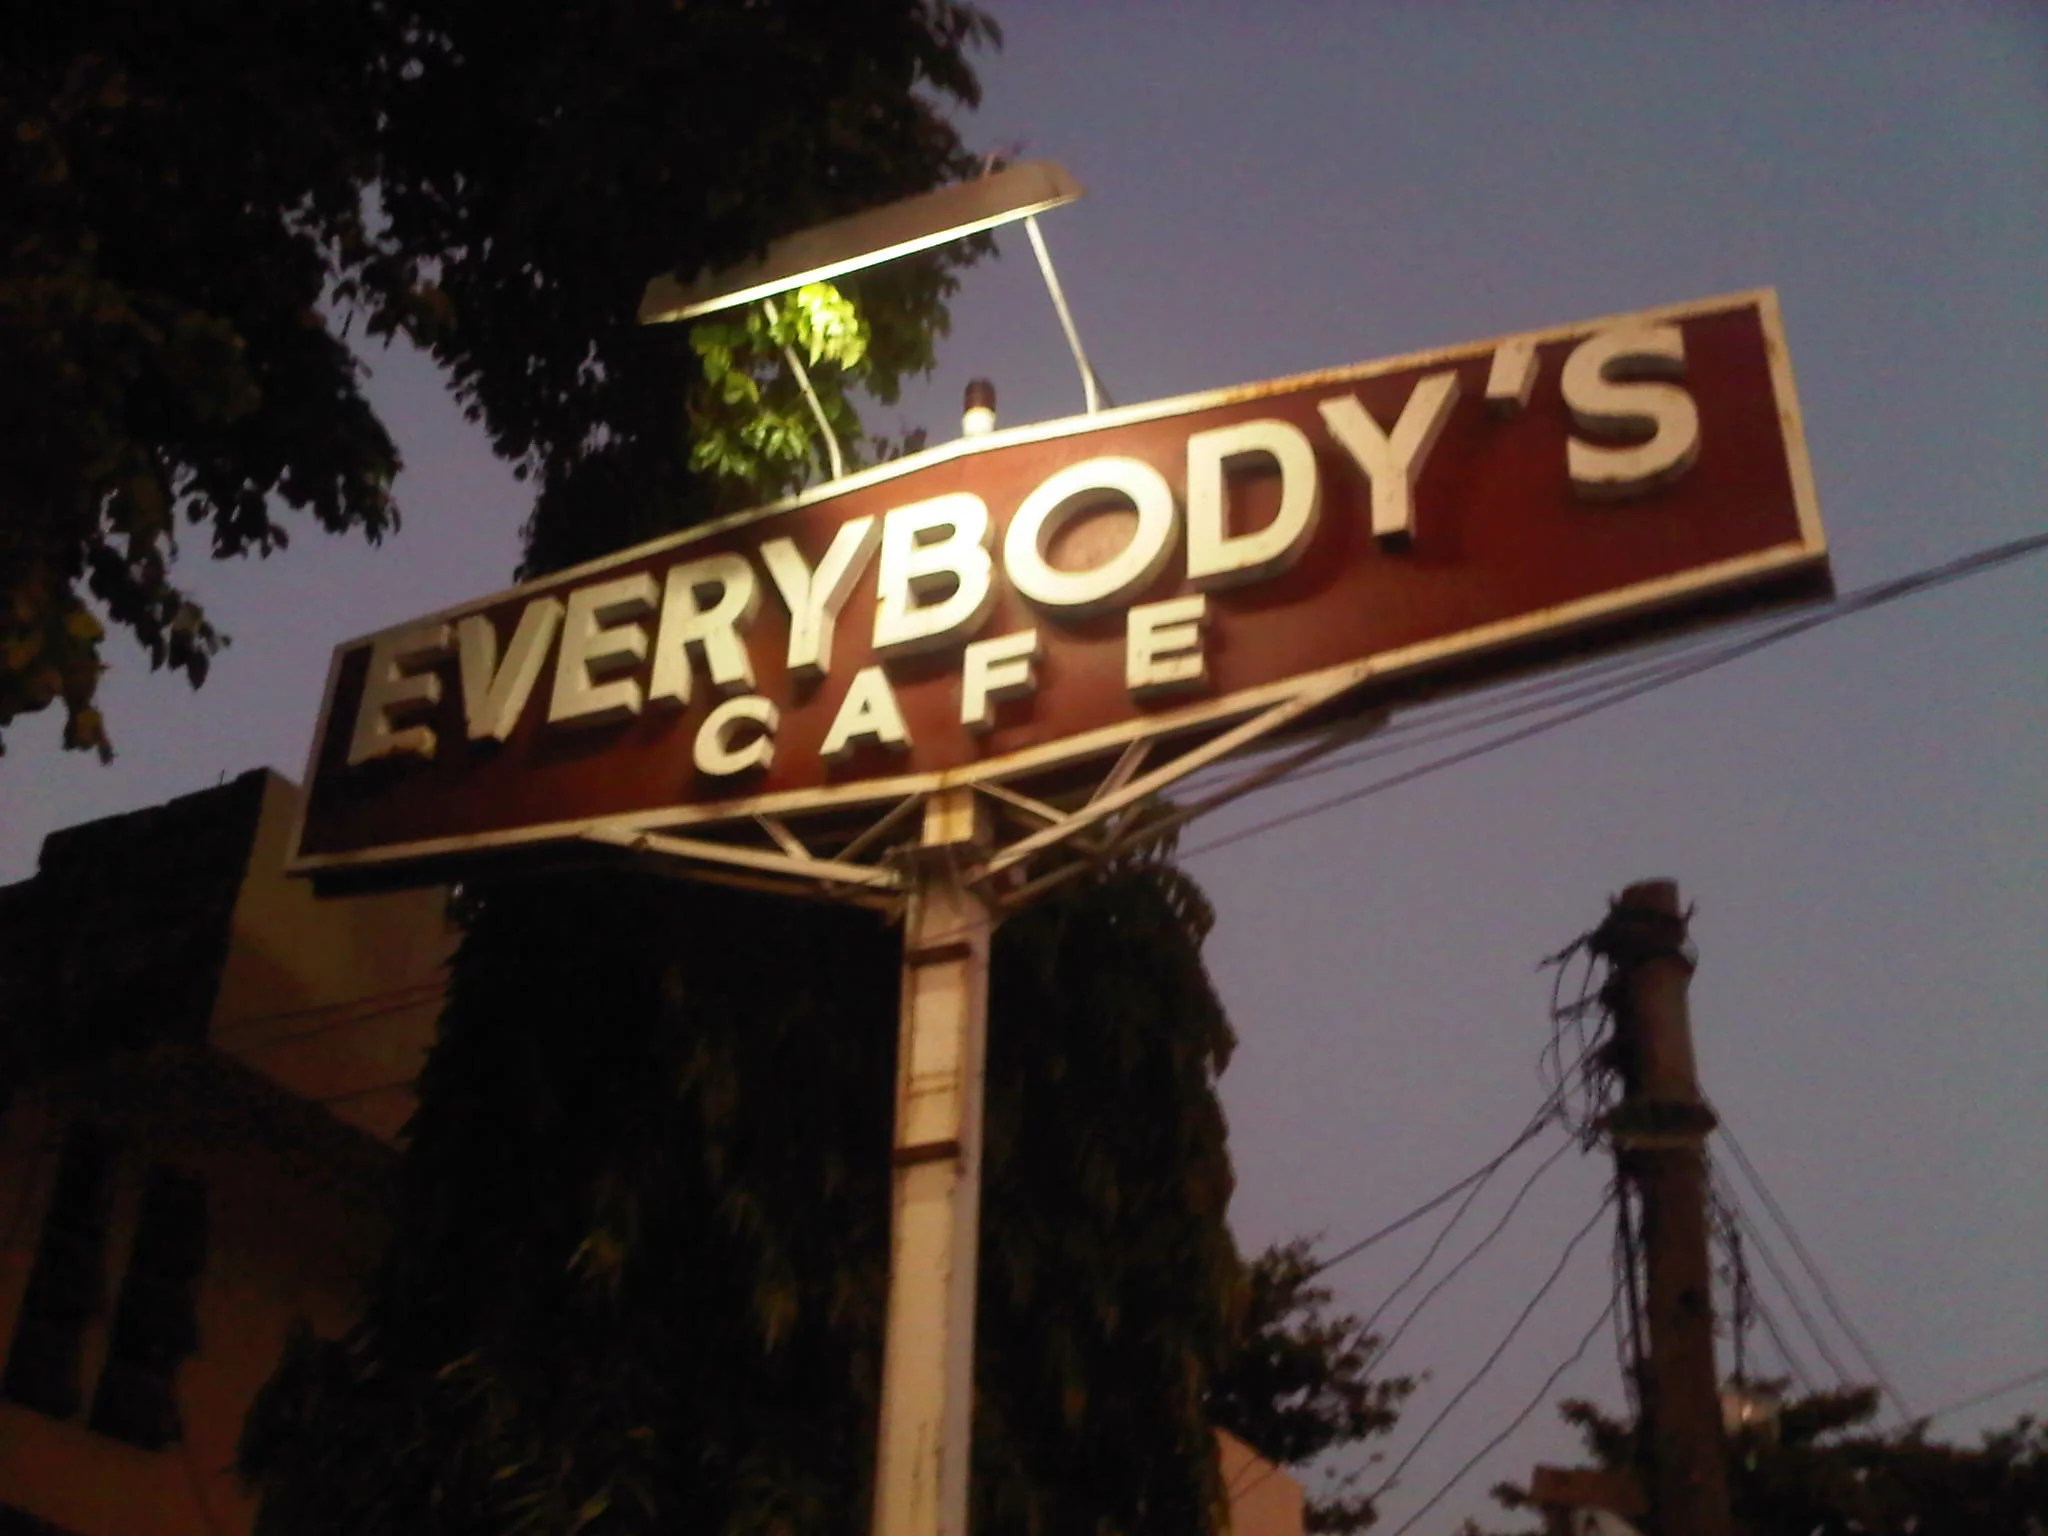 everybodys cafe 1